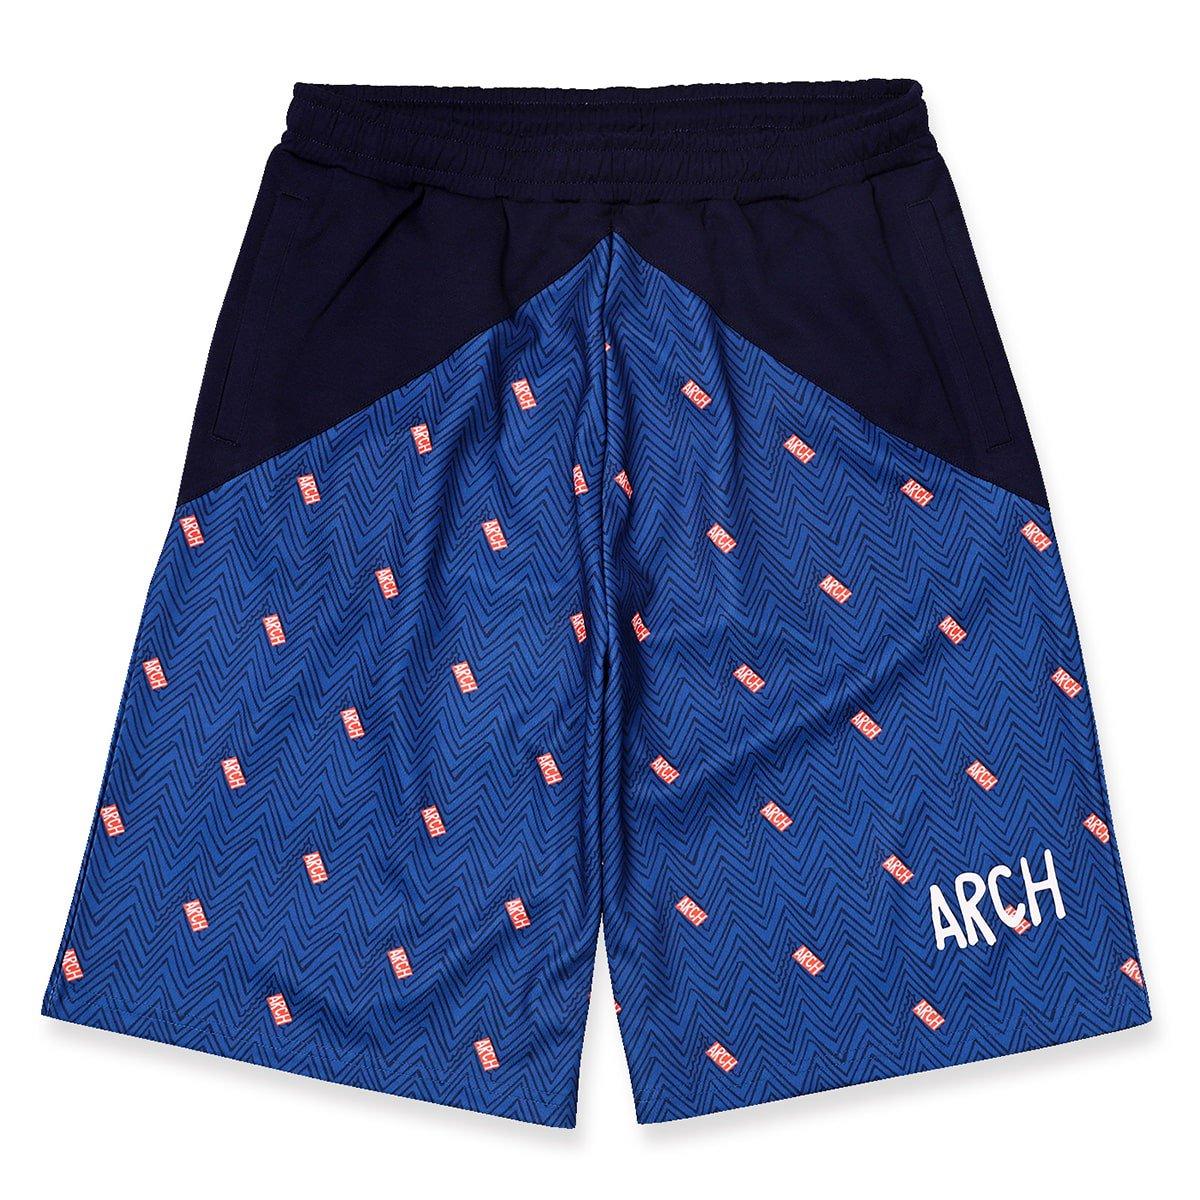 jaggy shorts【navy】